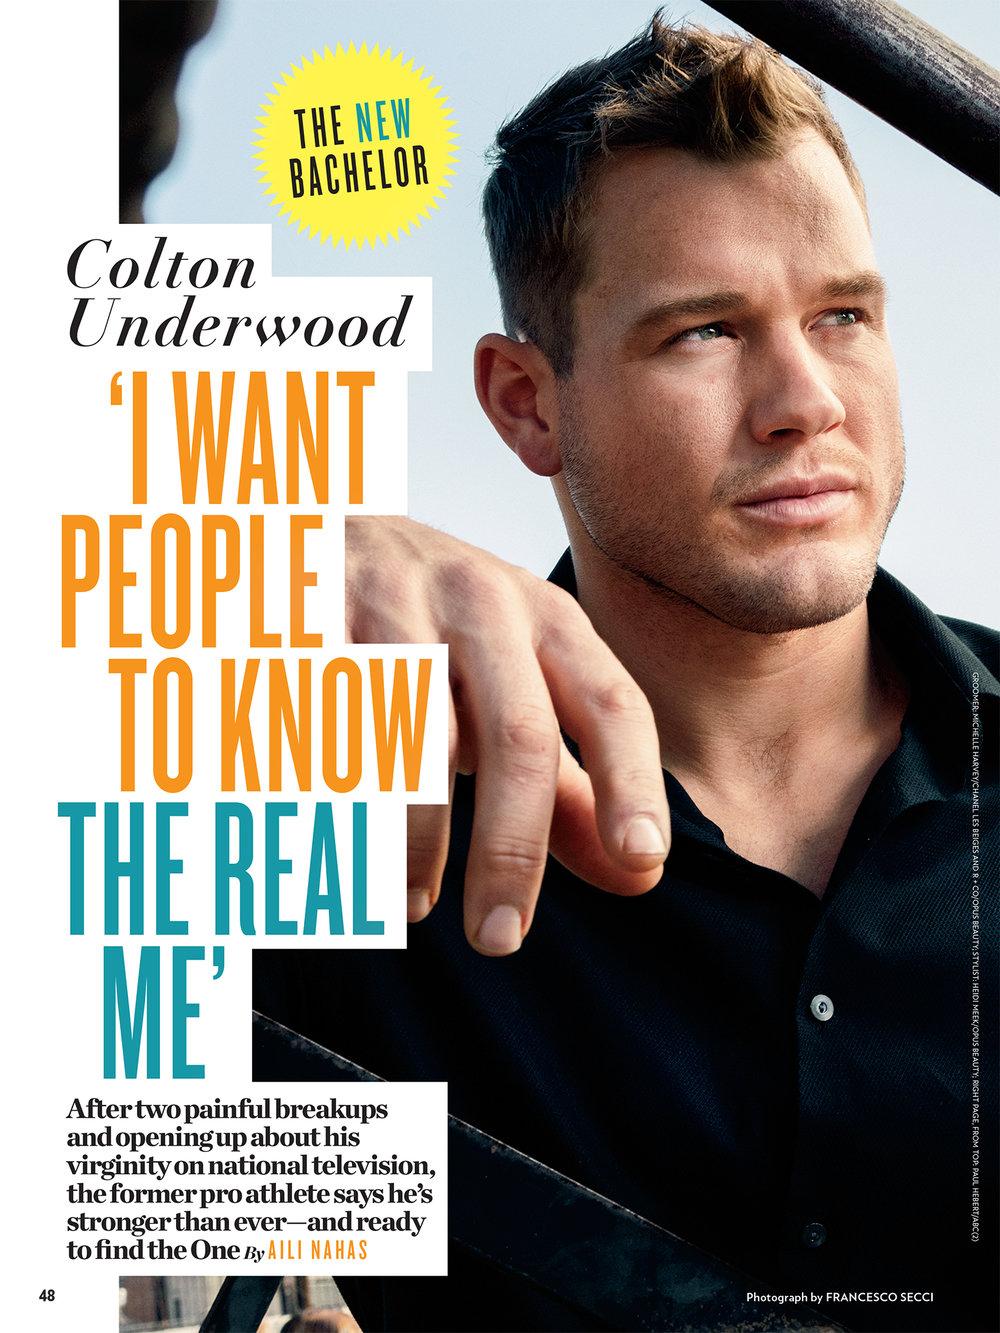 Bachelor, Colton Underwood 2-1.jpg